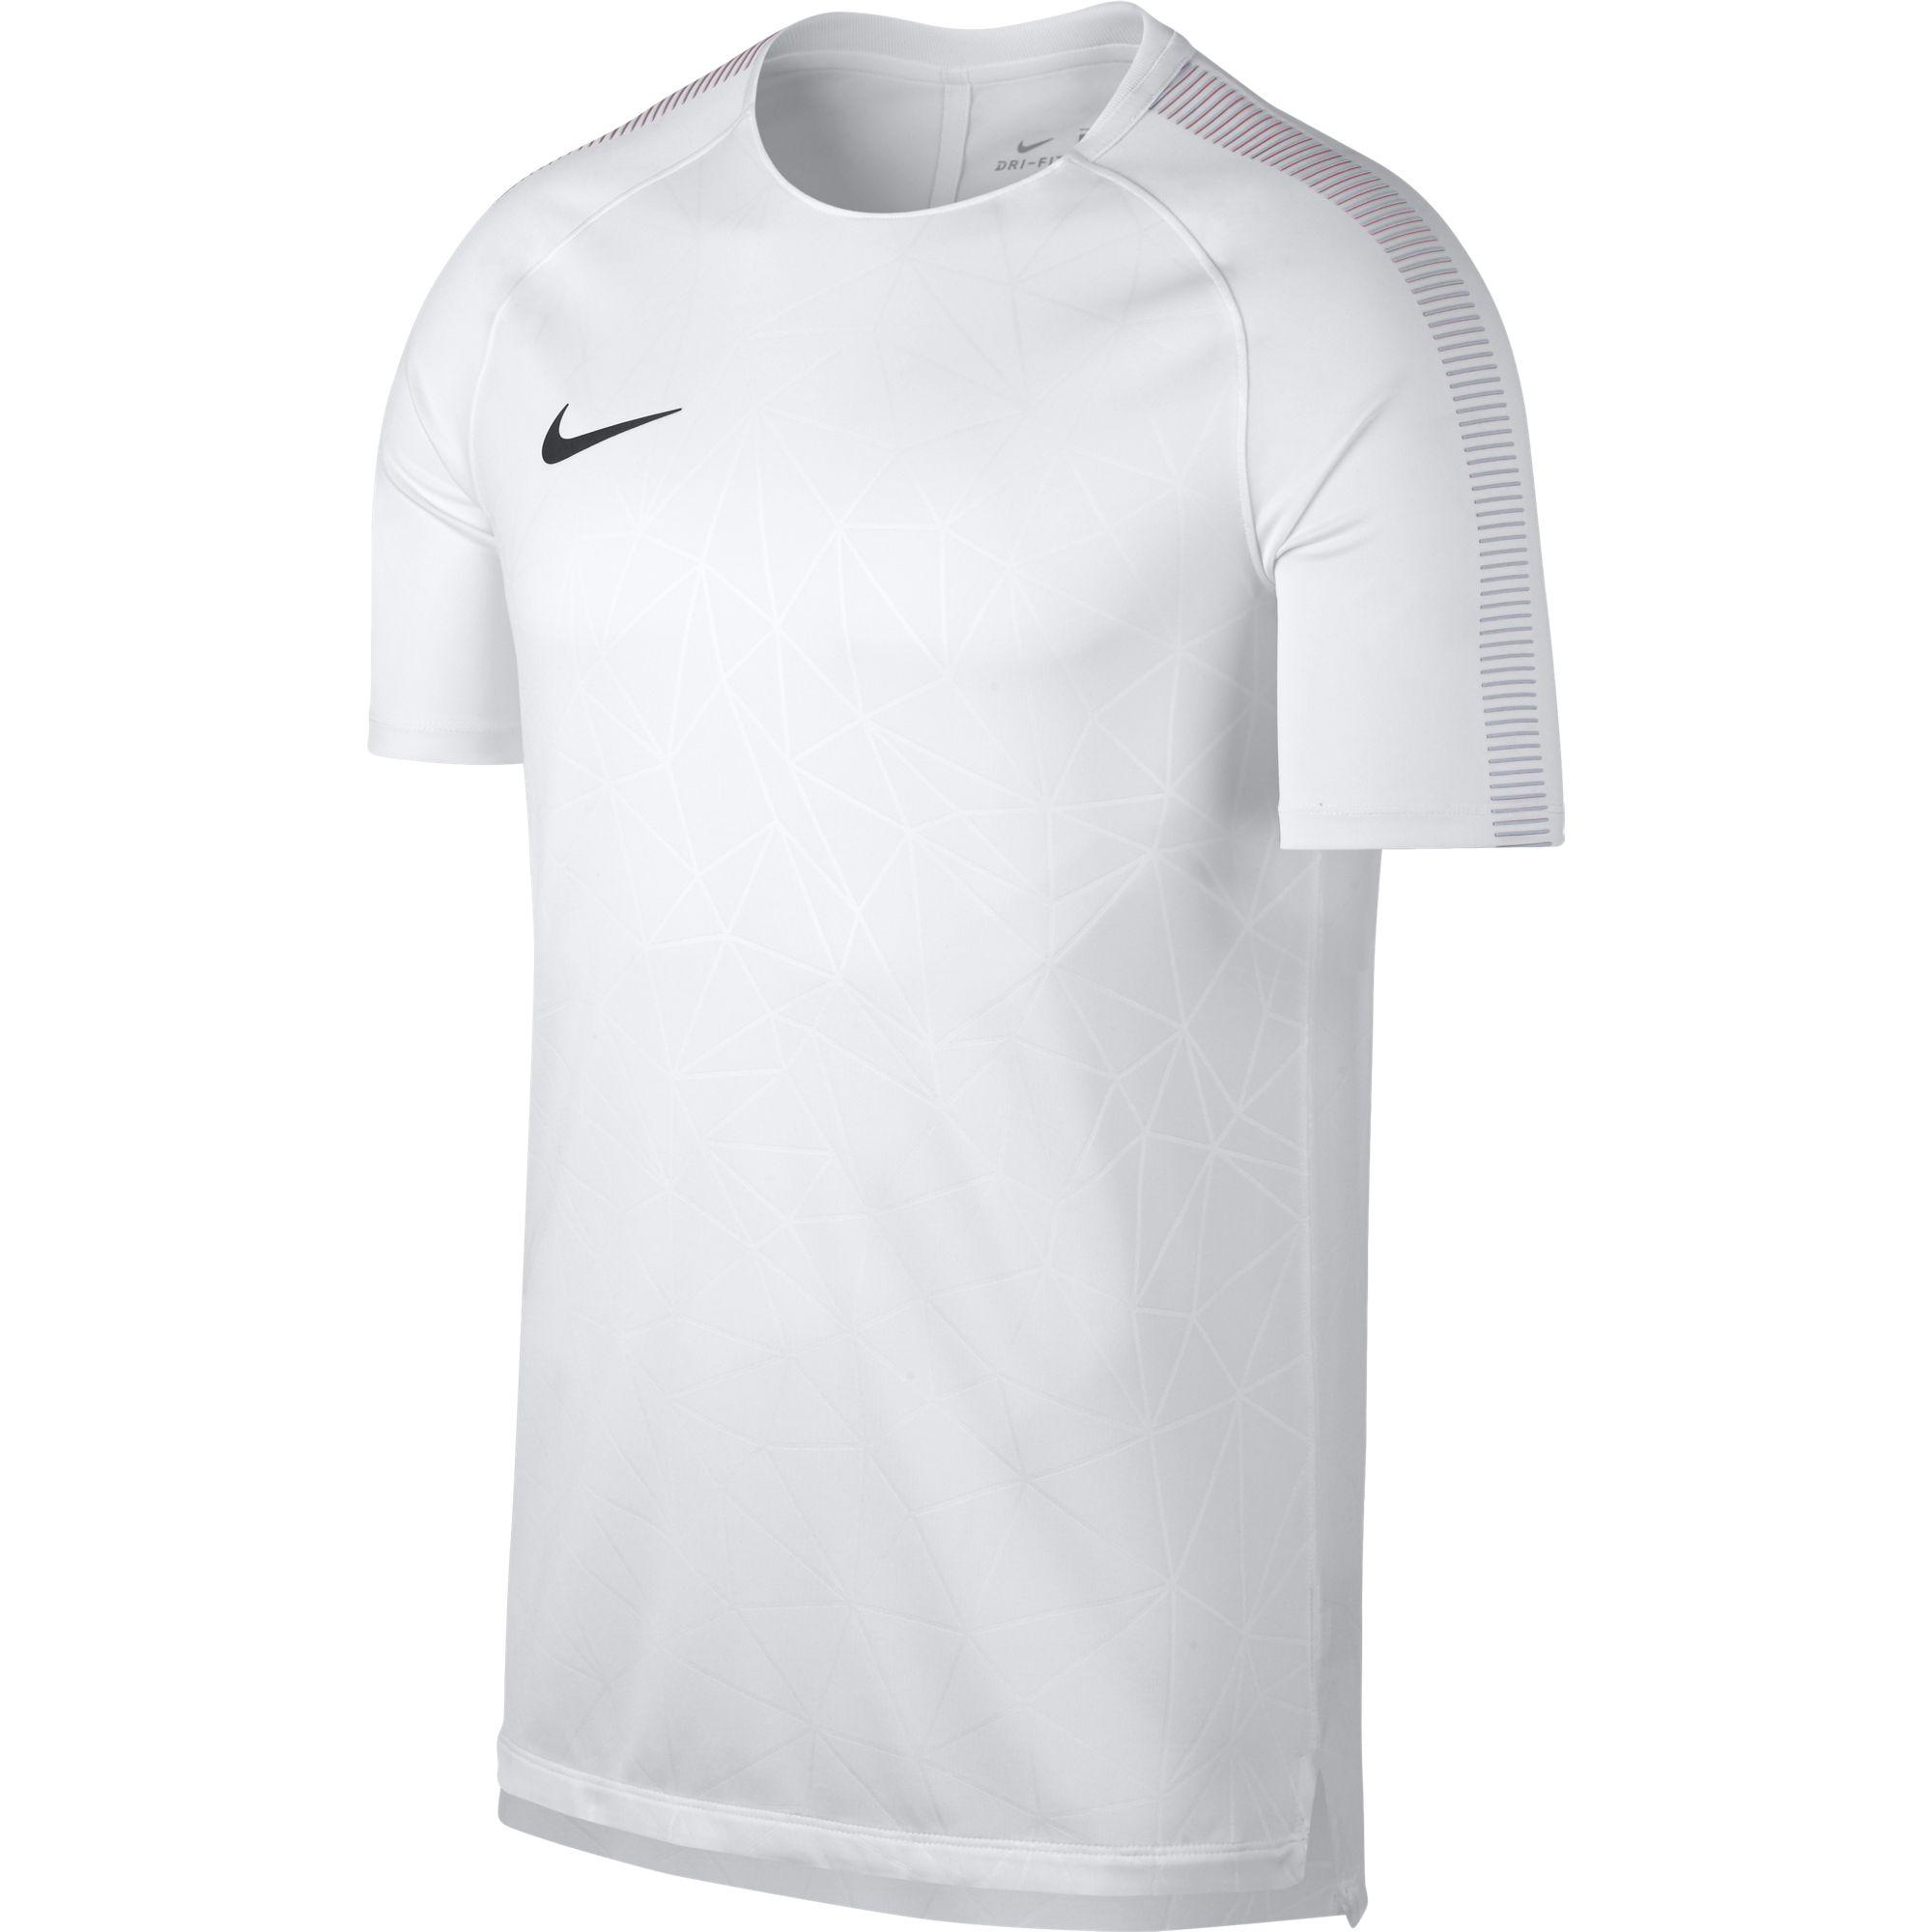 04487c67a381b6 Nike Dry CR7 Squad Jersey - Herren T-Shirt Funktionsshirt - 882991-100 001